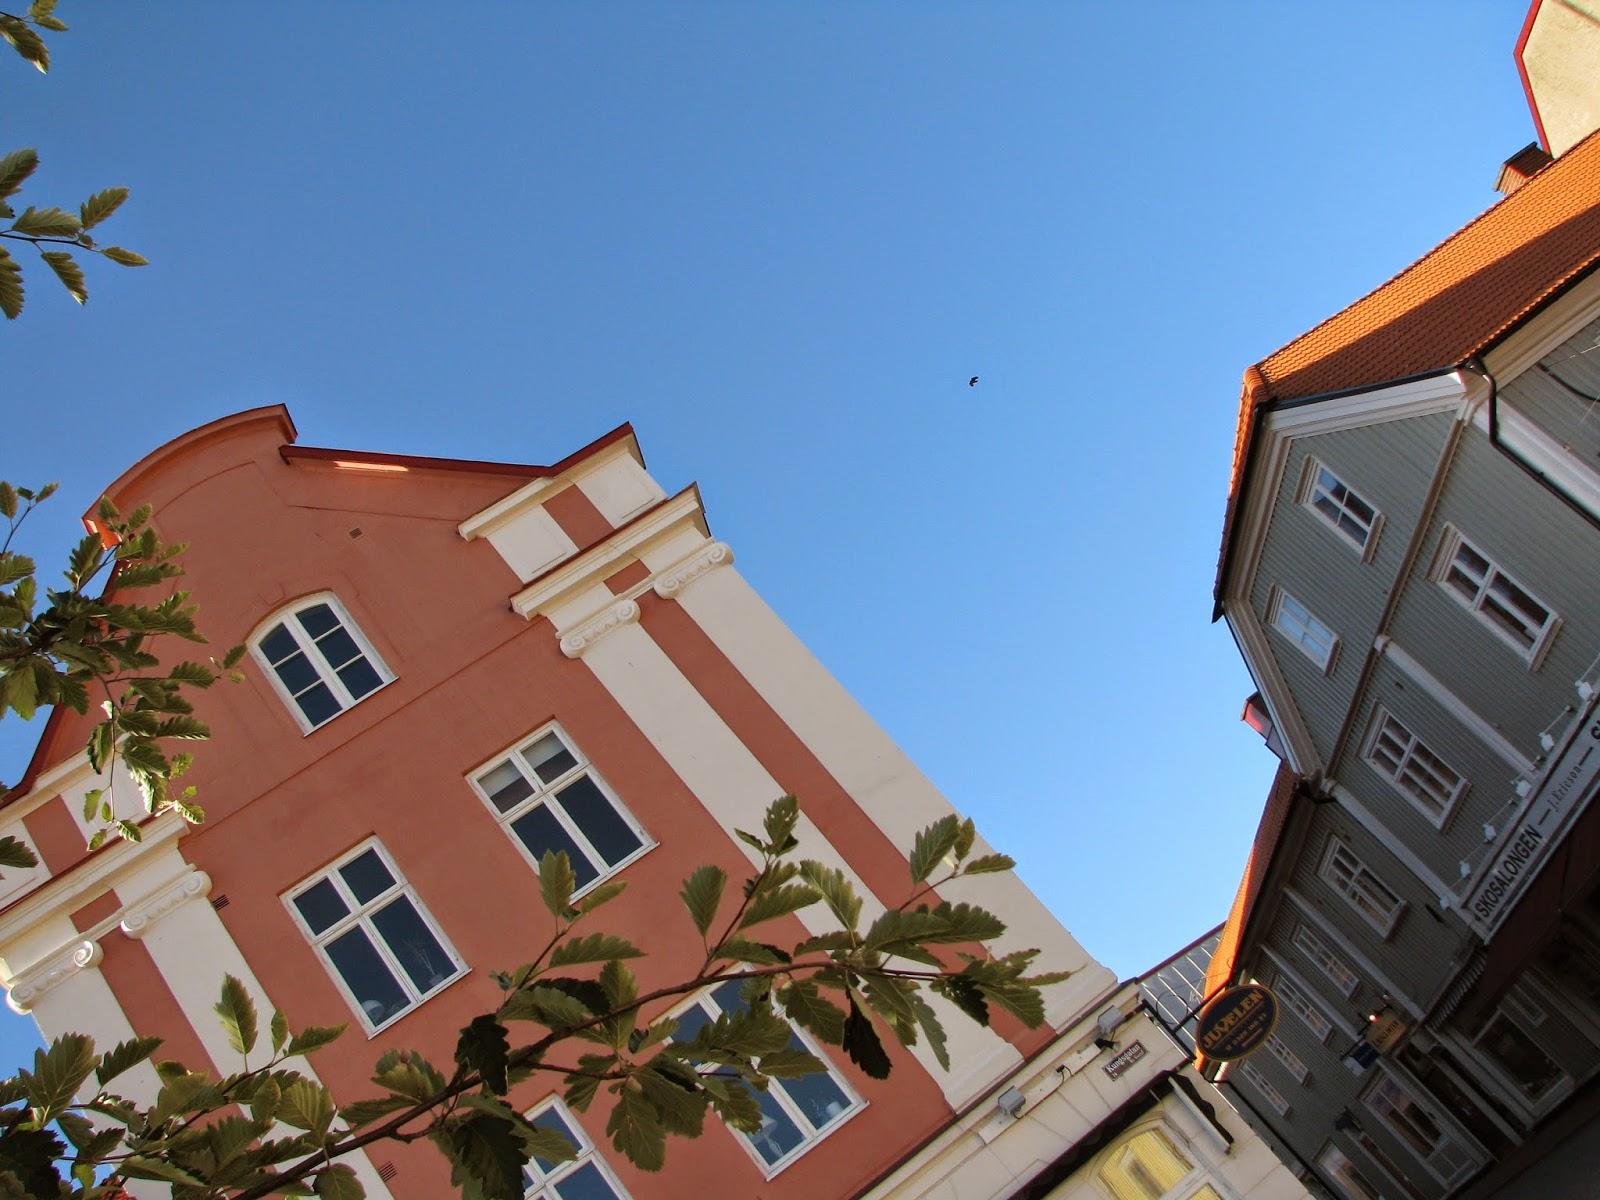 Energieffektivisering i äldre byggnader